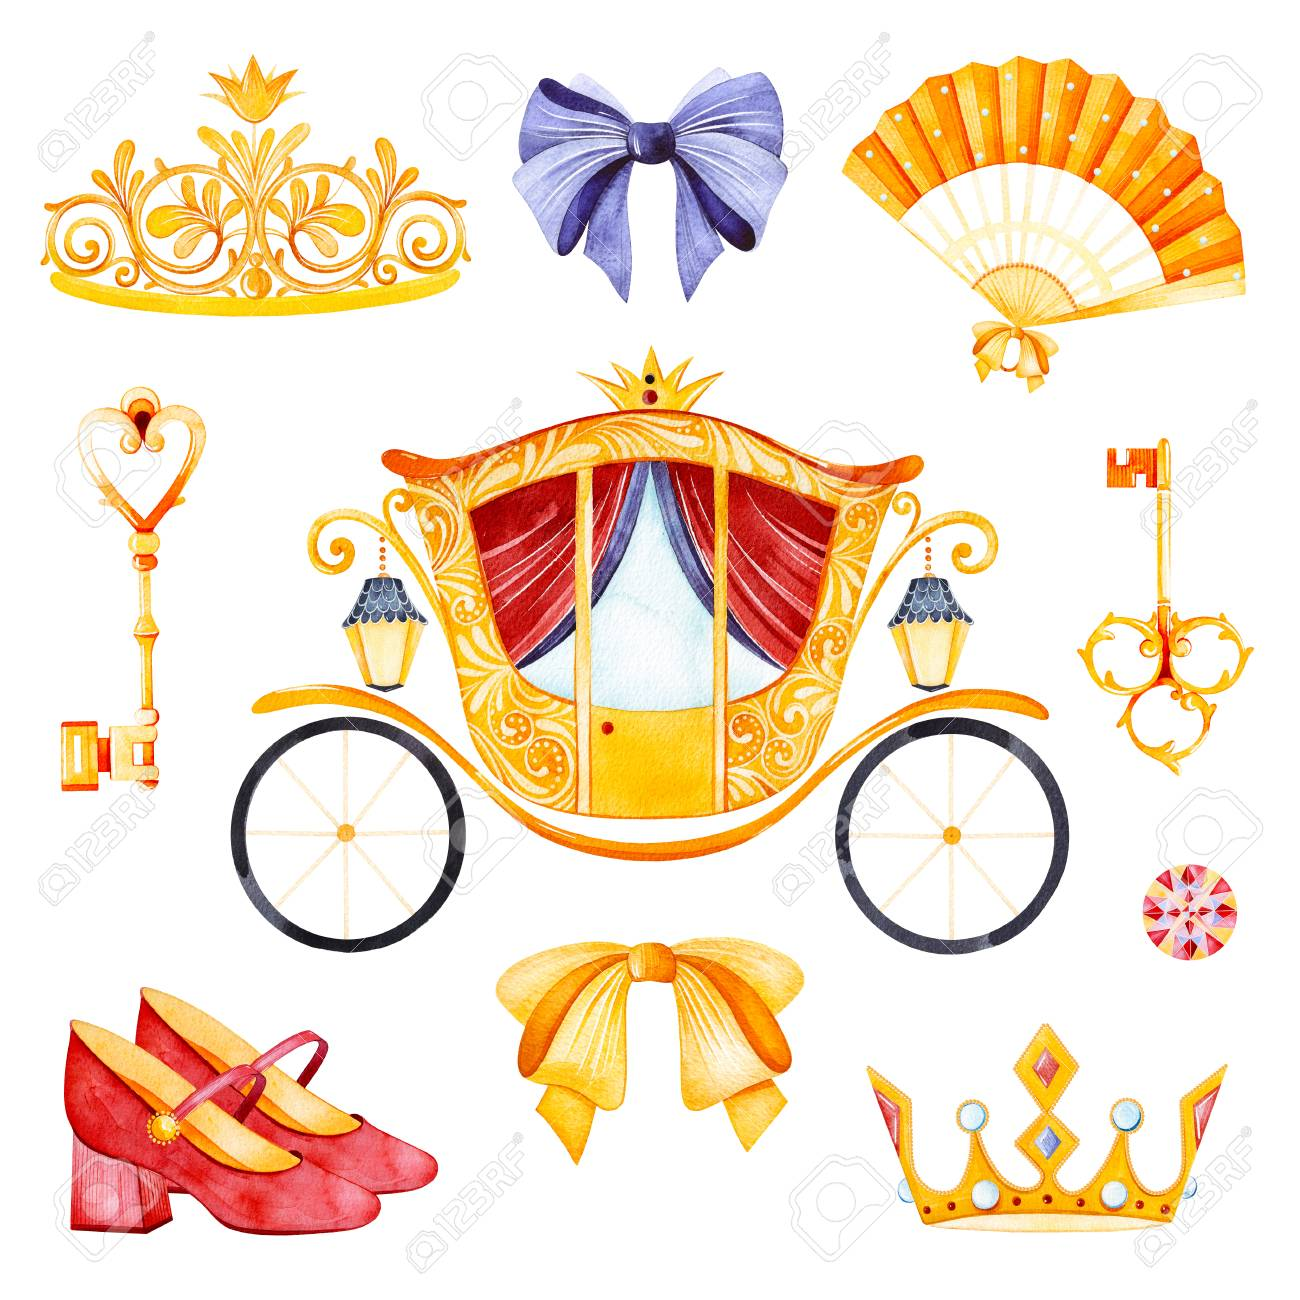 romantic set with princess carriage crown golden keys colorful rh 123rf com Wedding Shower Clip Art Bridal Shower Clip Art